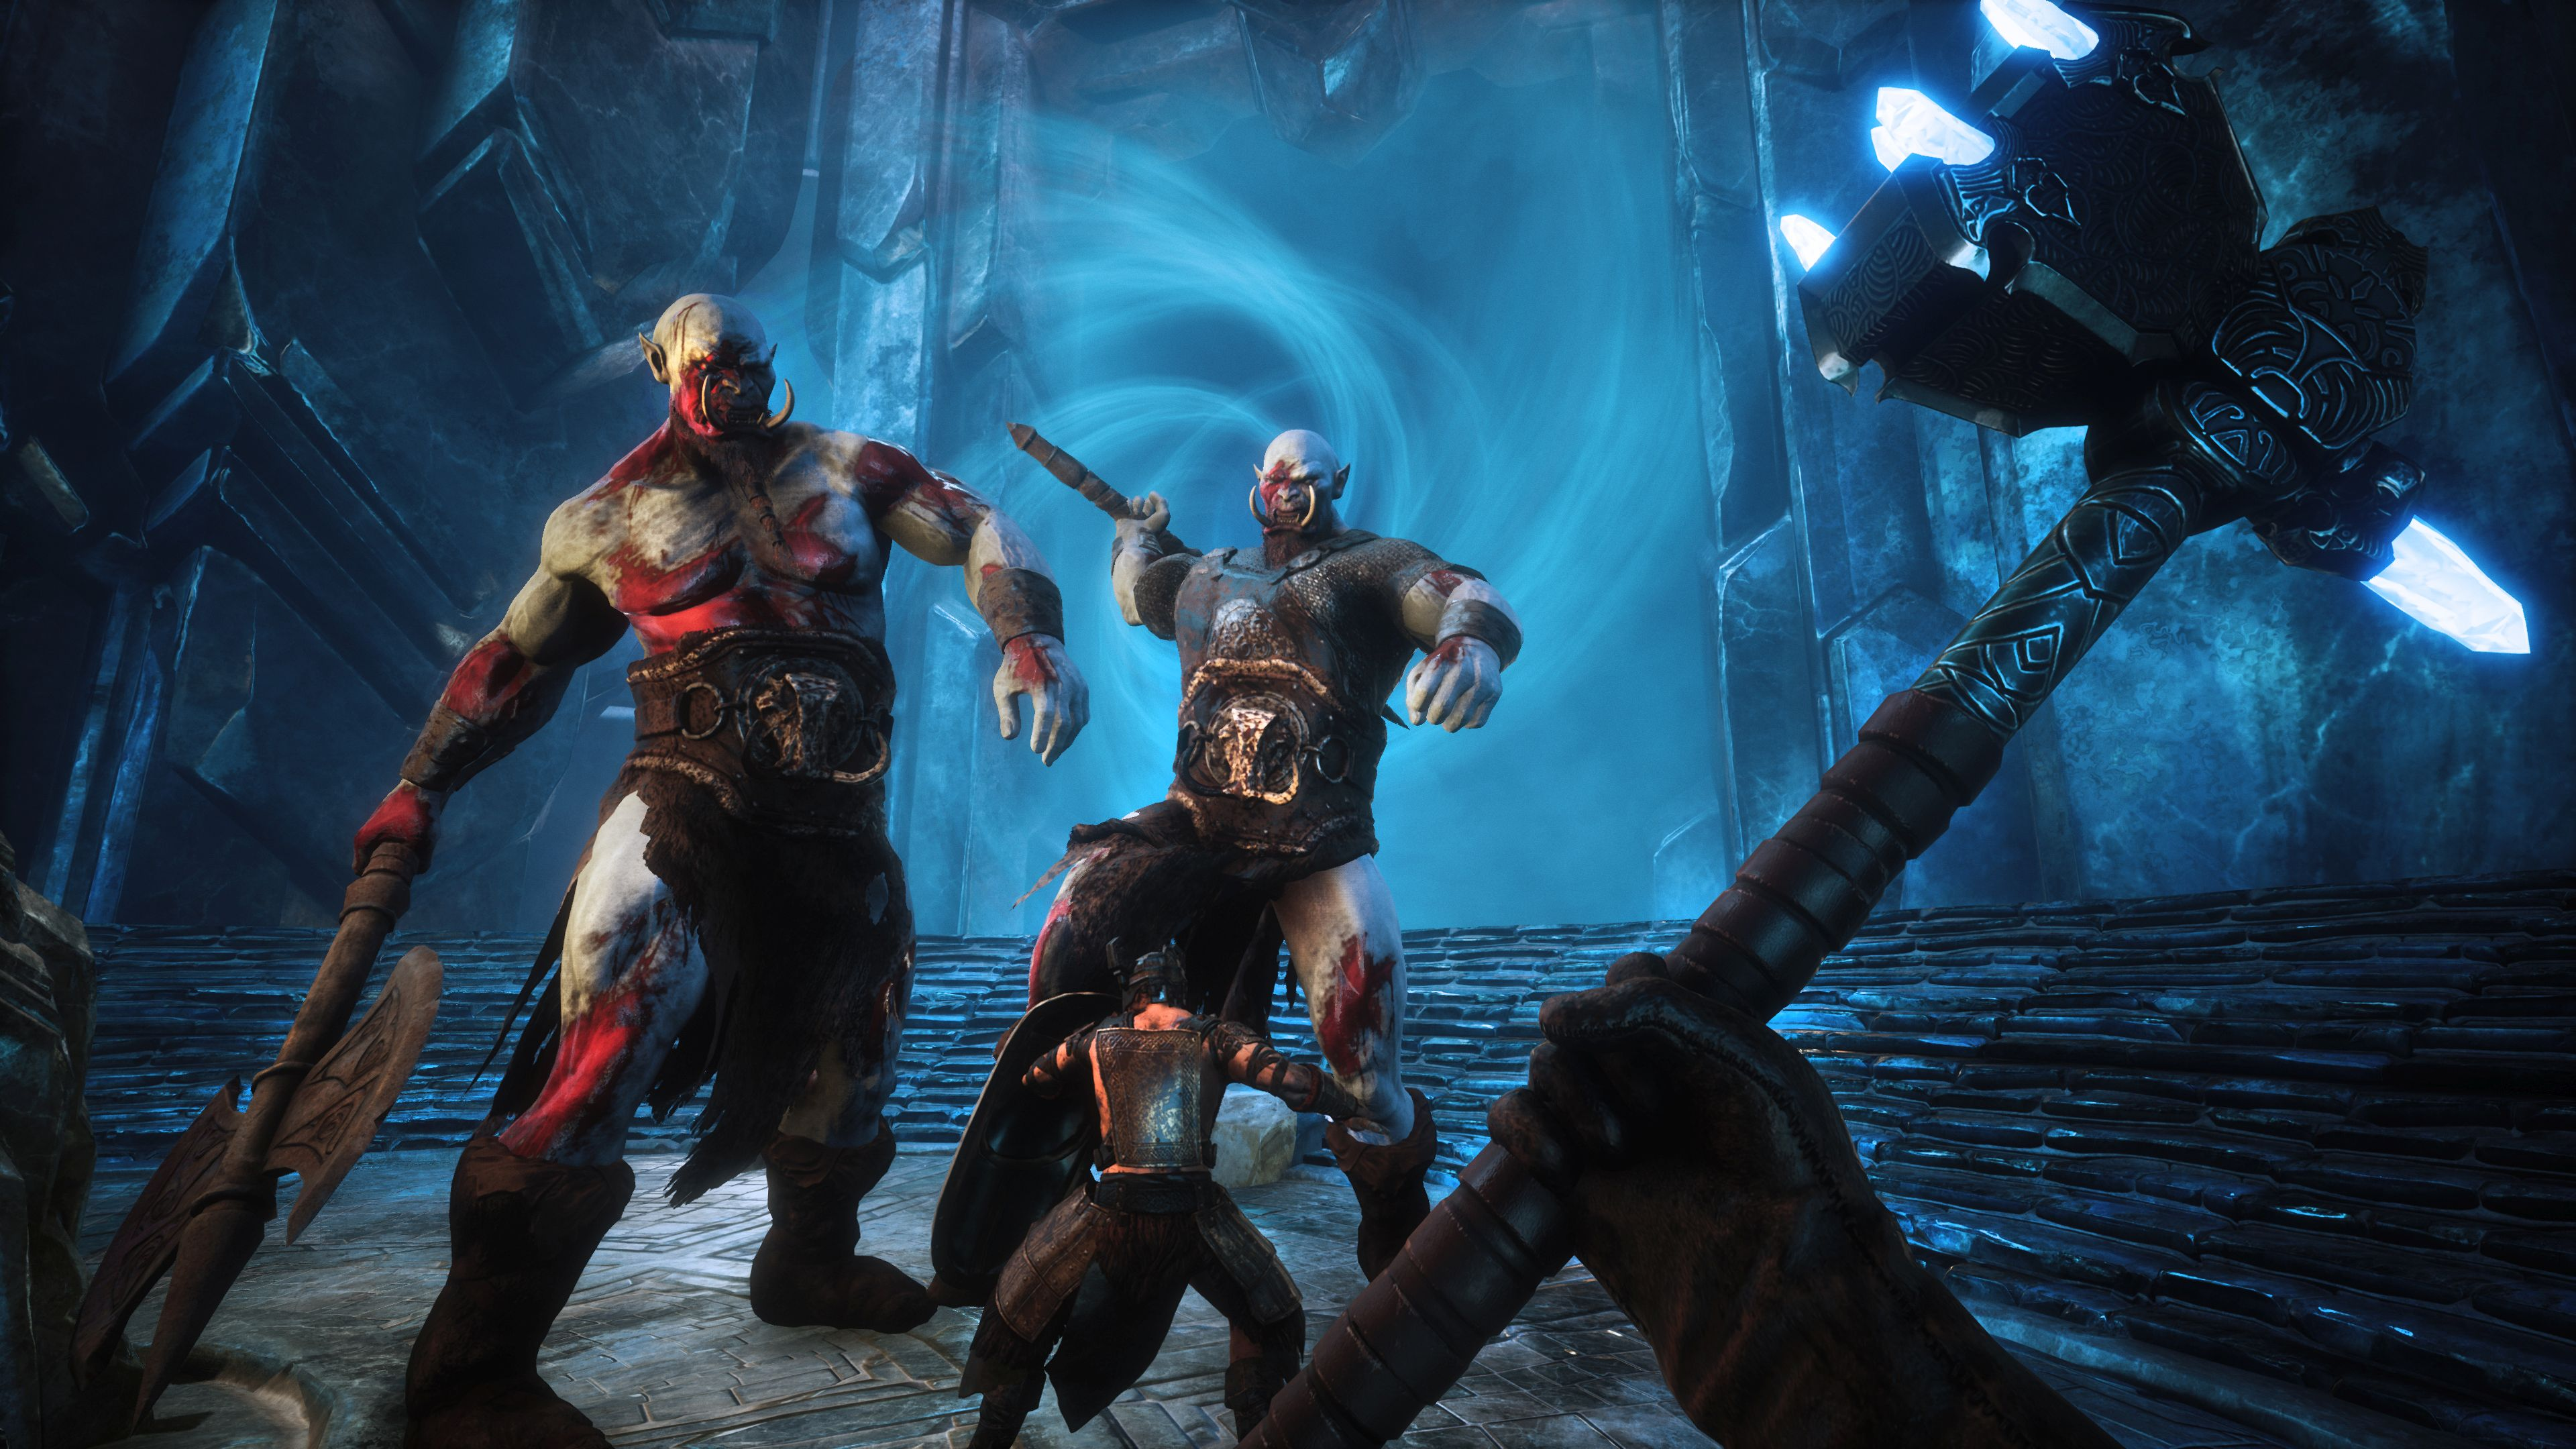 Conan Exiles The Frozen North Expansion Announced